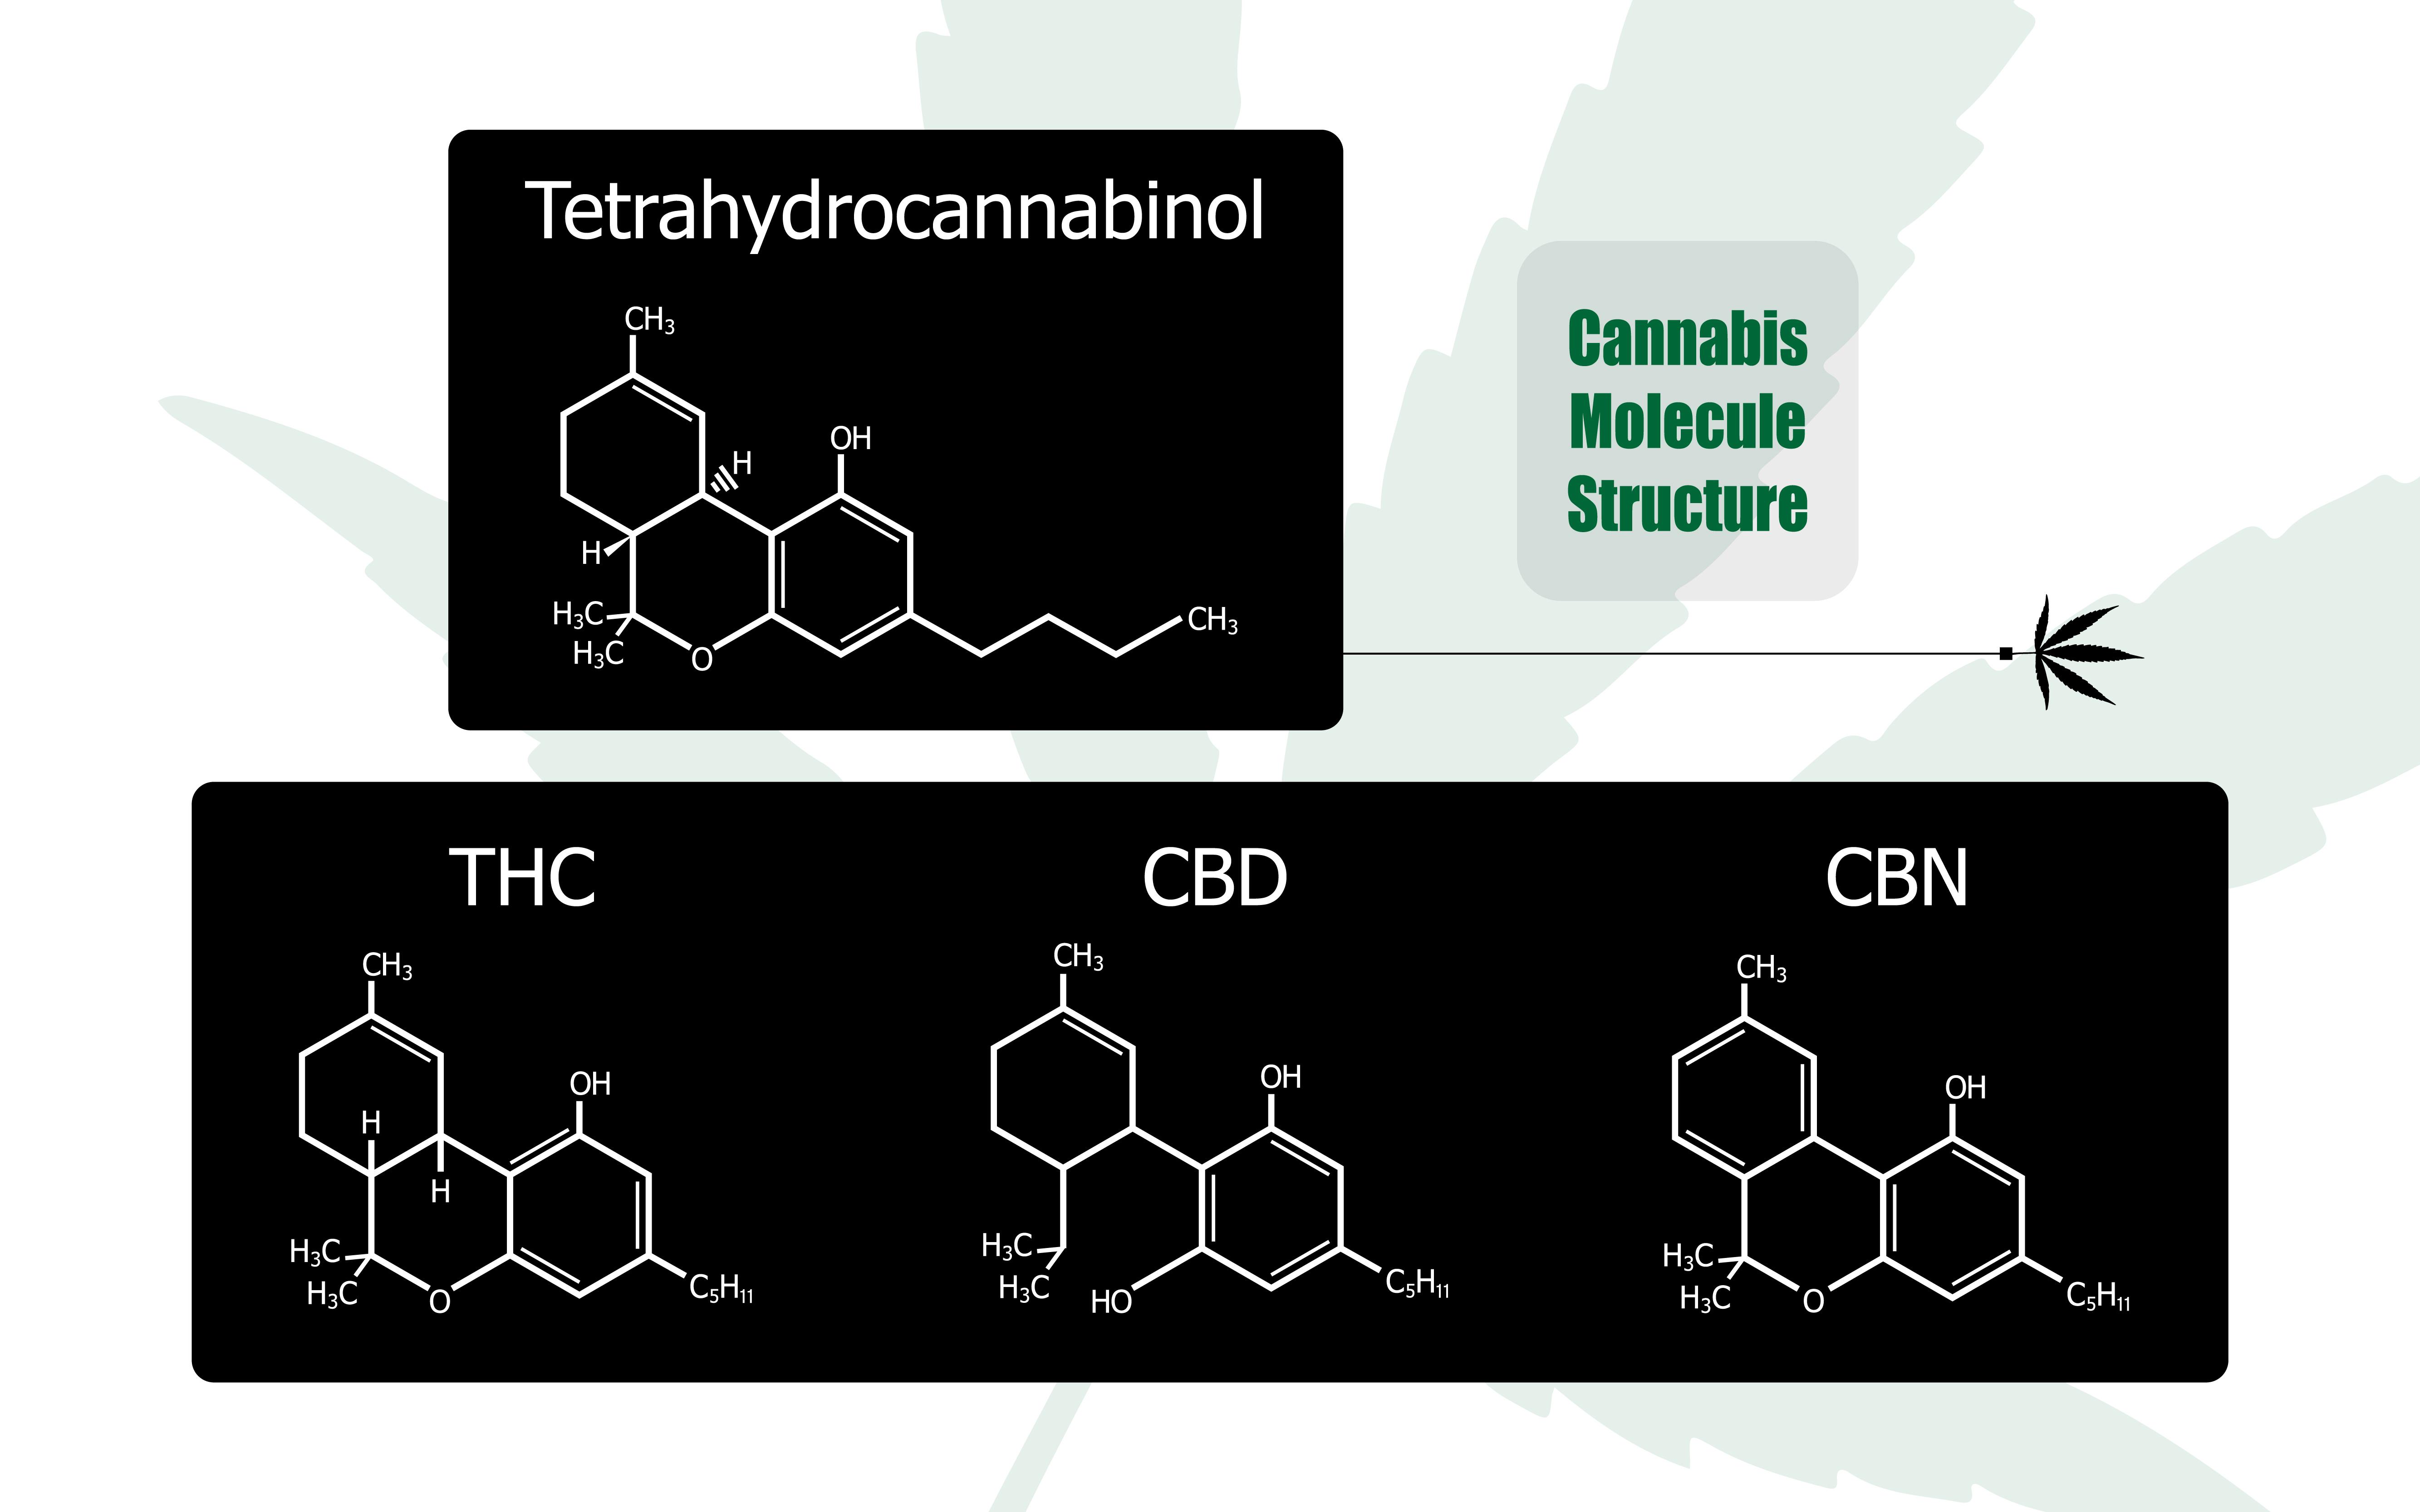 CBD THC effet entourage contrebande symbiose système immunitaire psyché cannabis marijuana médicale cannabinoïde endocannabinoïde moduler